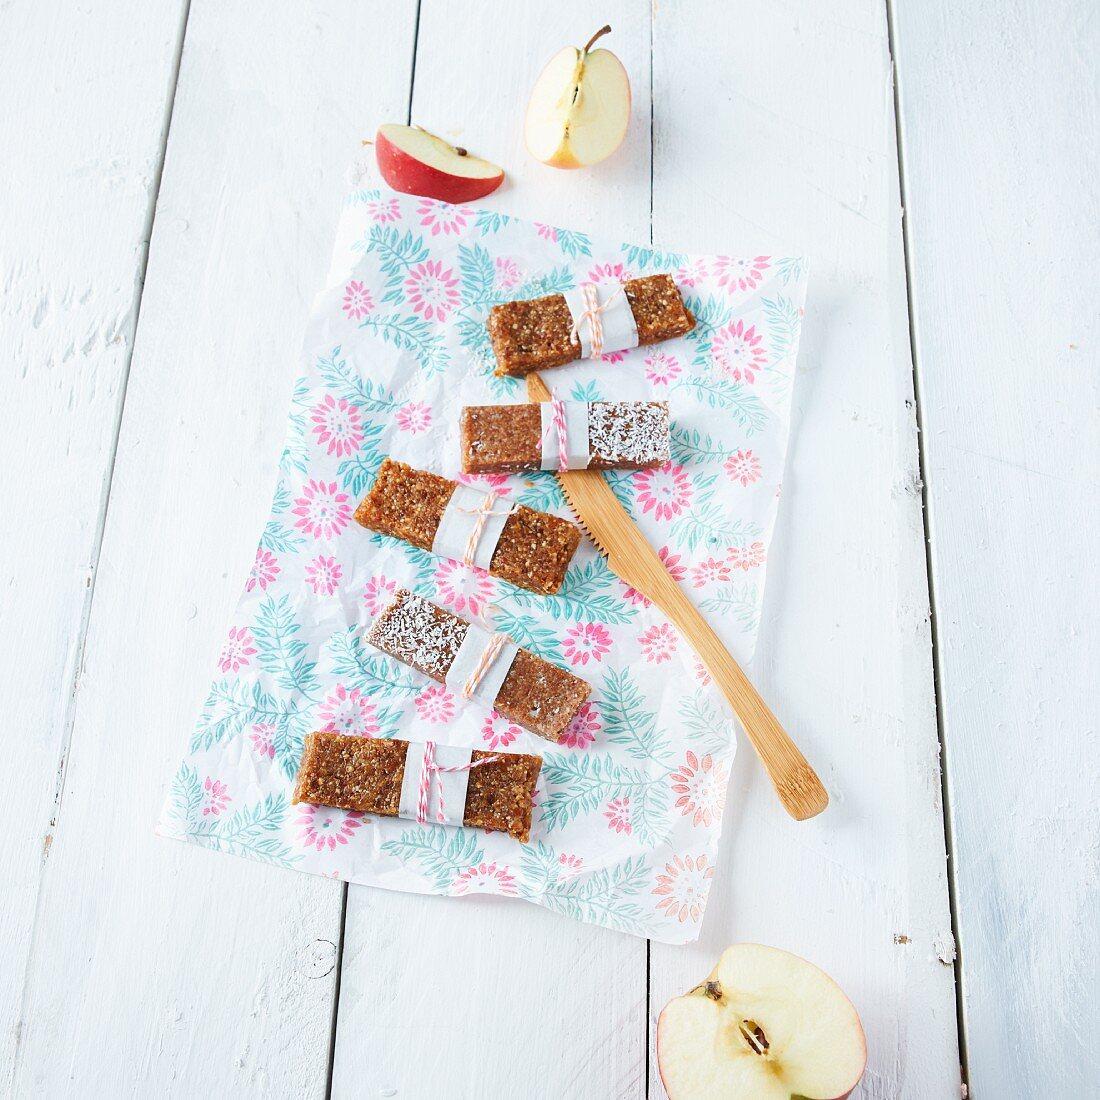 Take-away coconut and apple bars